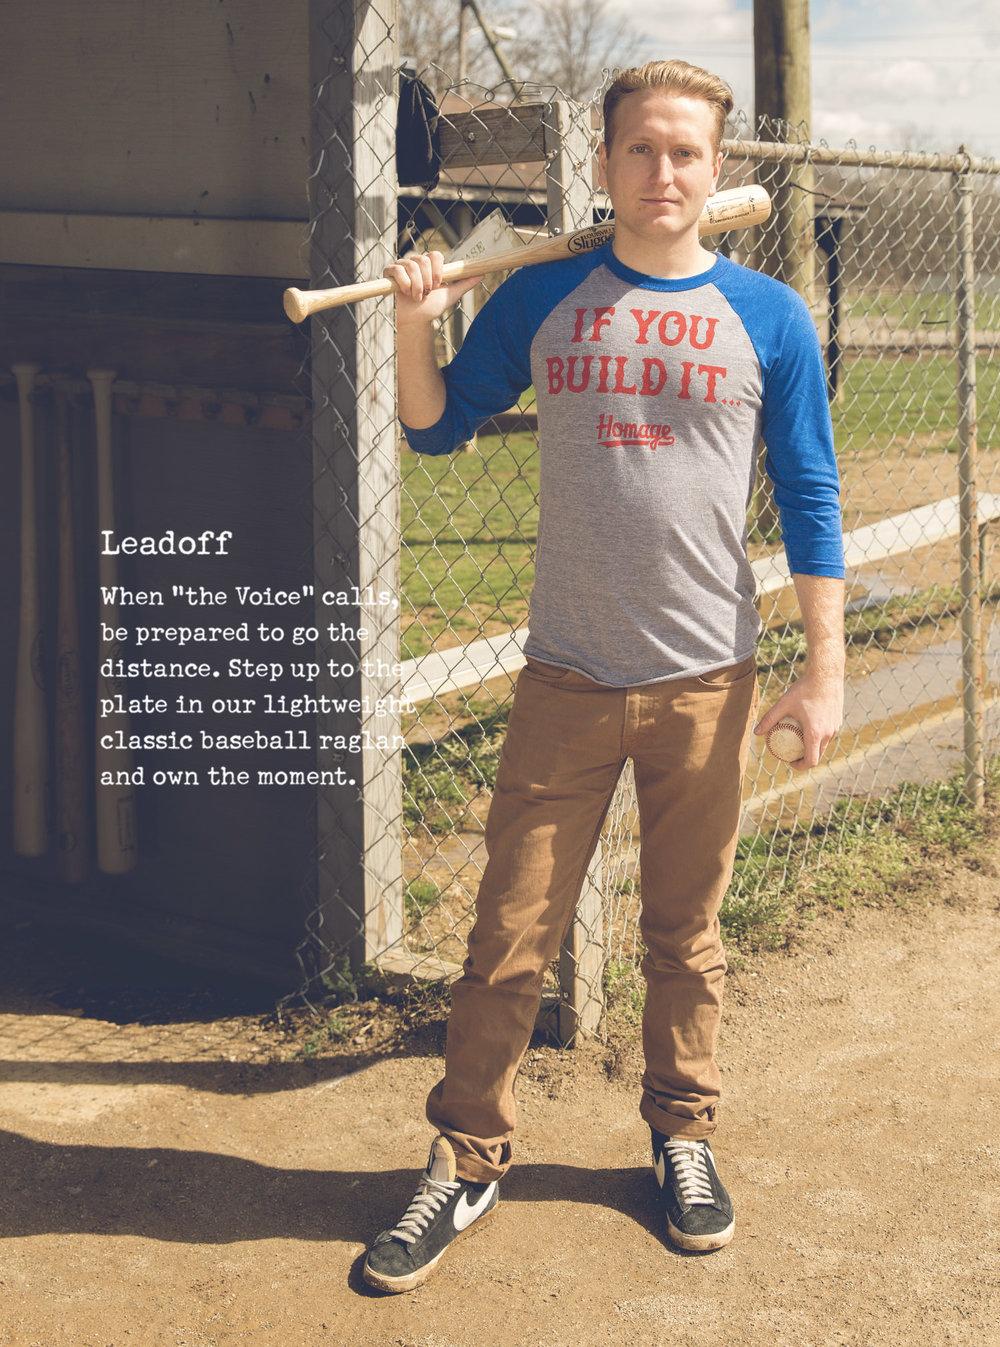 homage-baseball-if-you-build-it.jpg